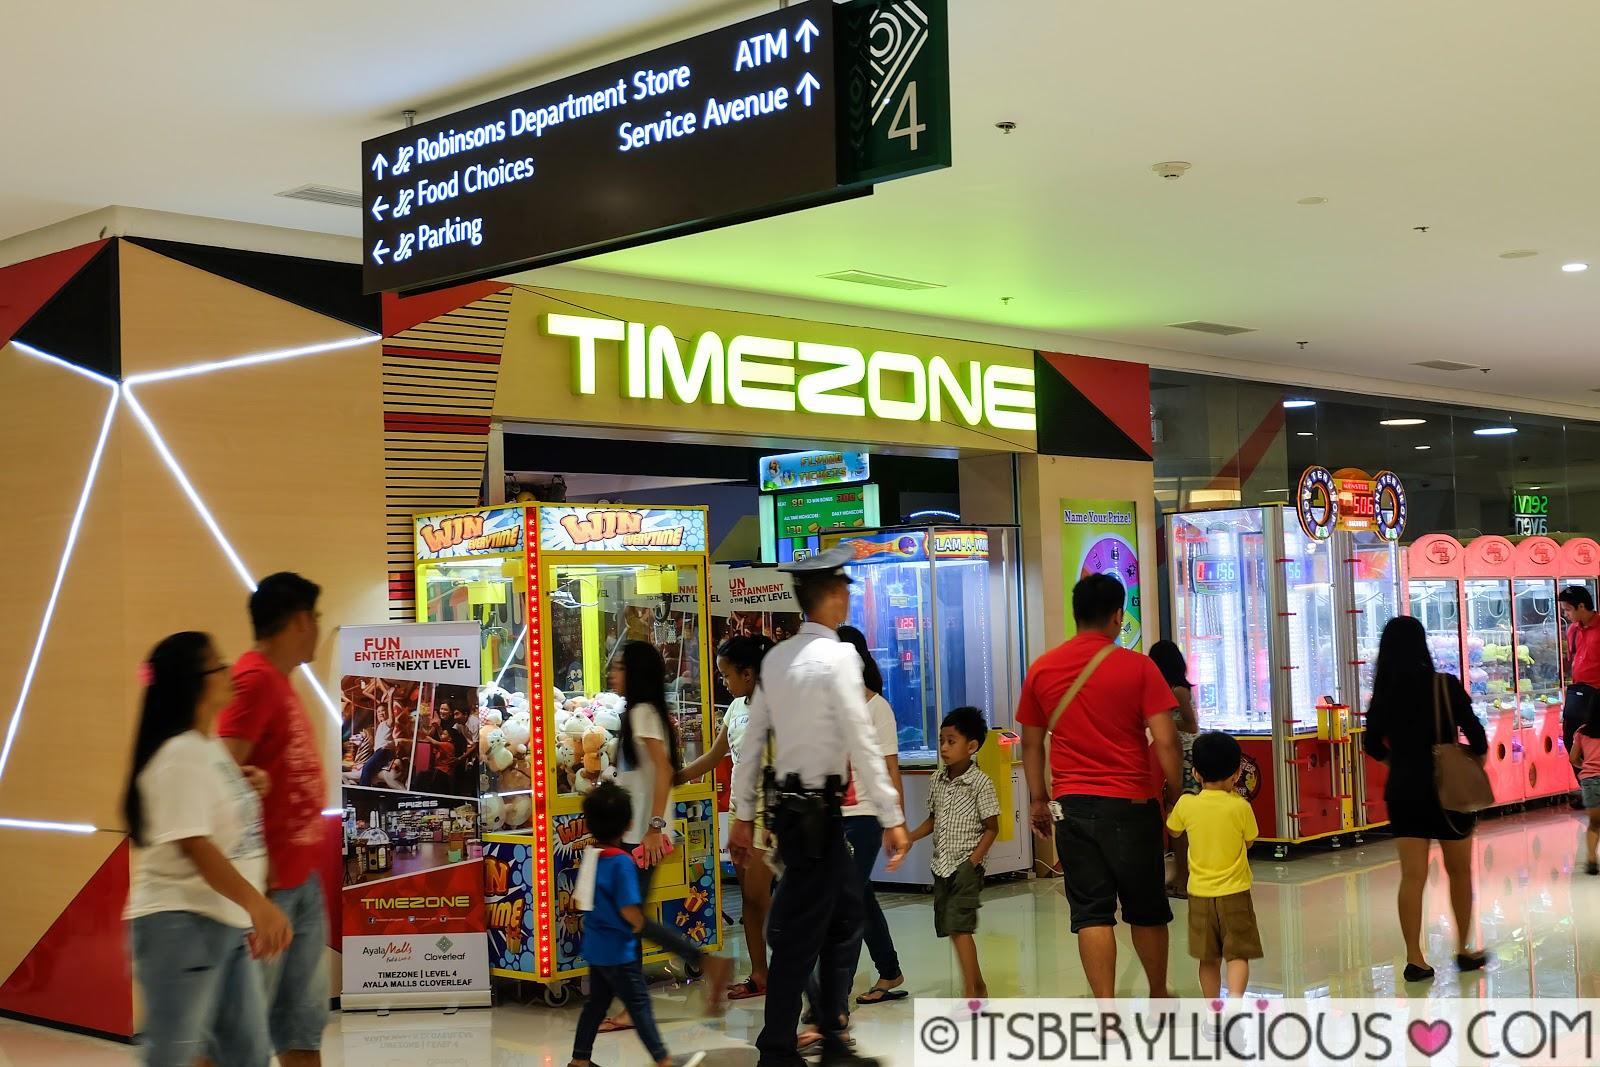 Ayala Malls Cloverleaf Balintawak The Newest Lifestyle